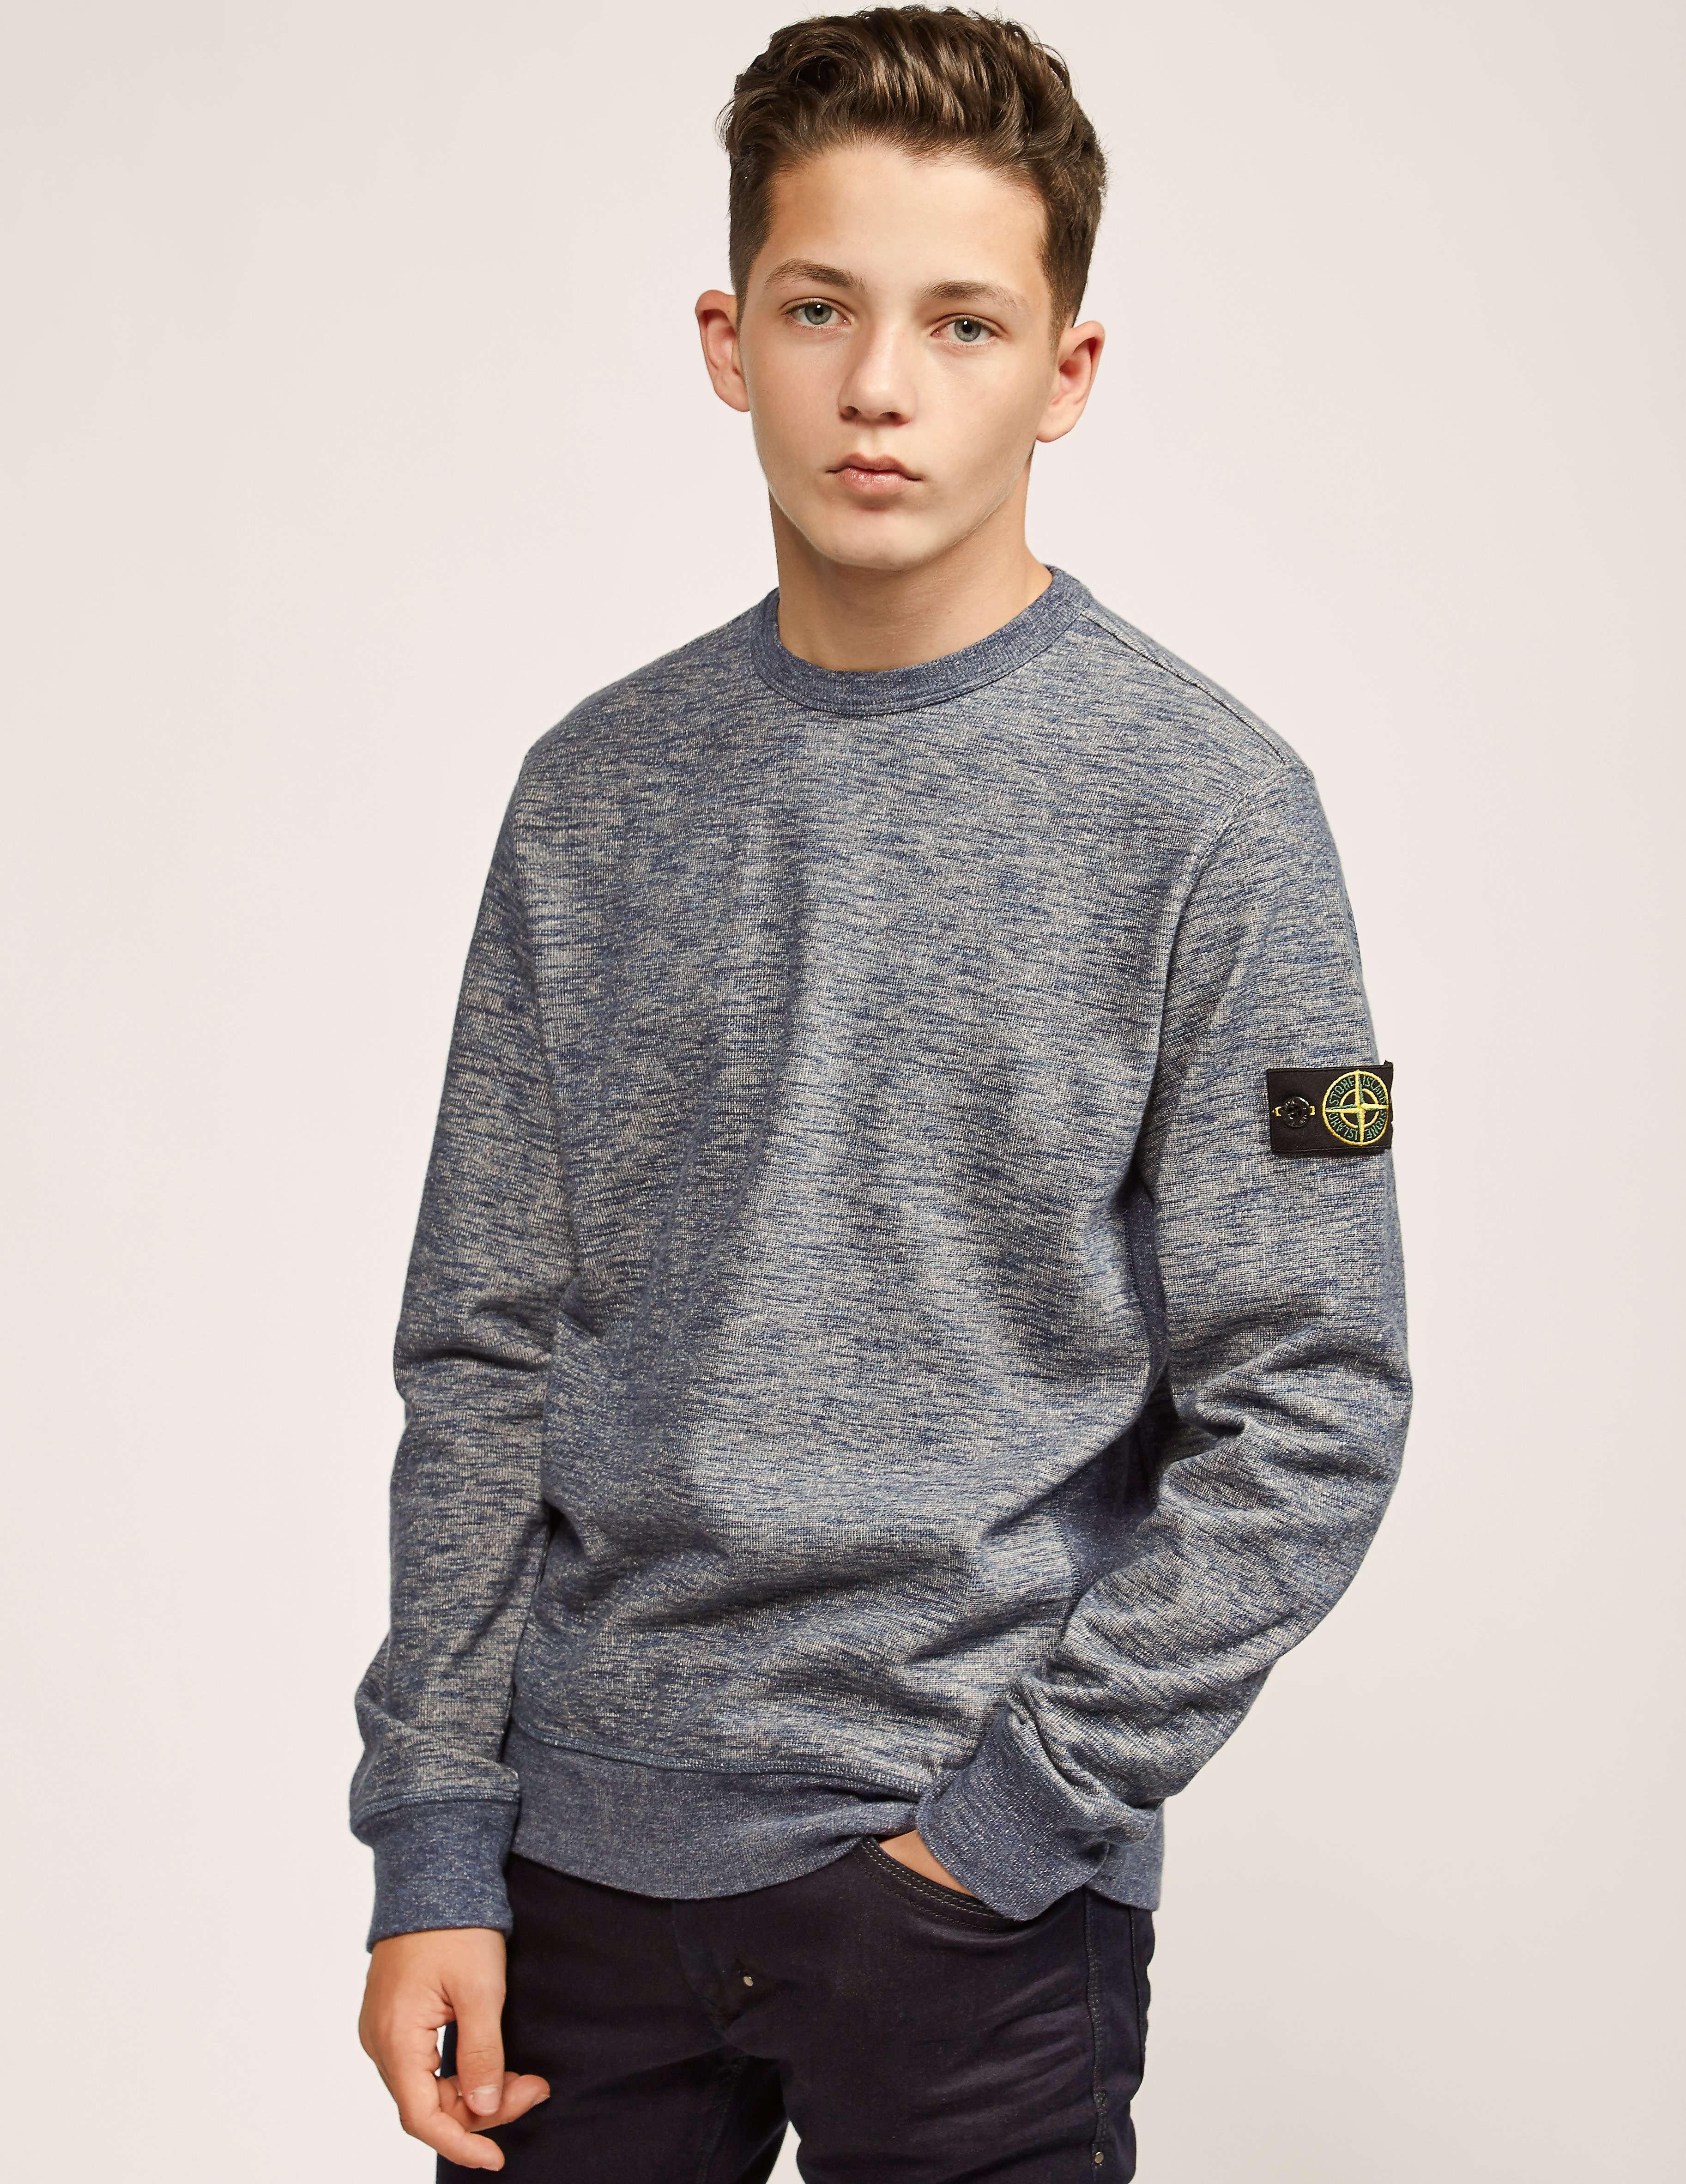 stone island jumper sale junior sweater vest. Black Bedroom Furniture Sets. Home Design Ideas